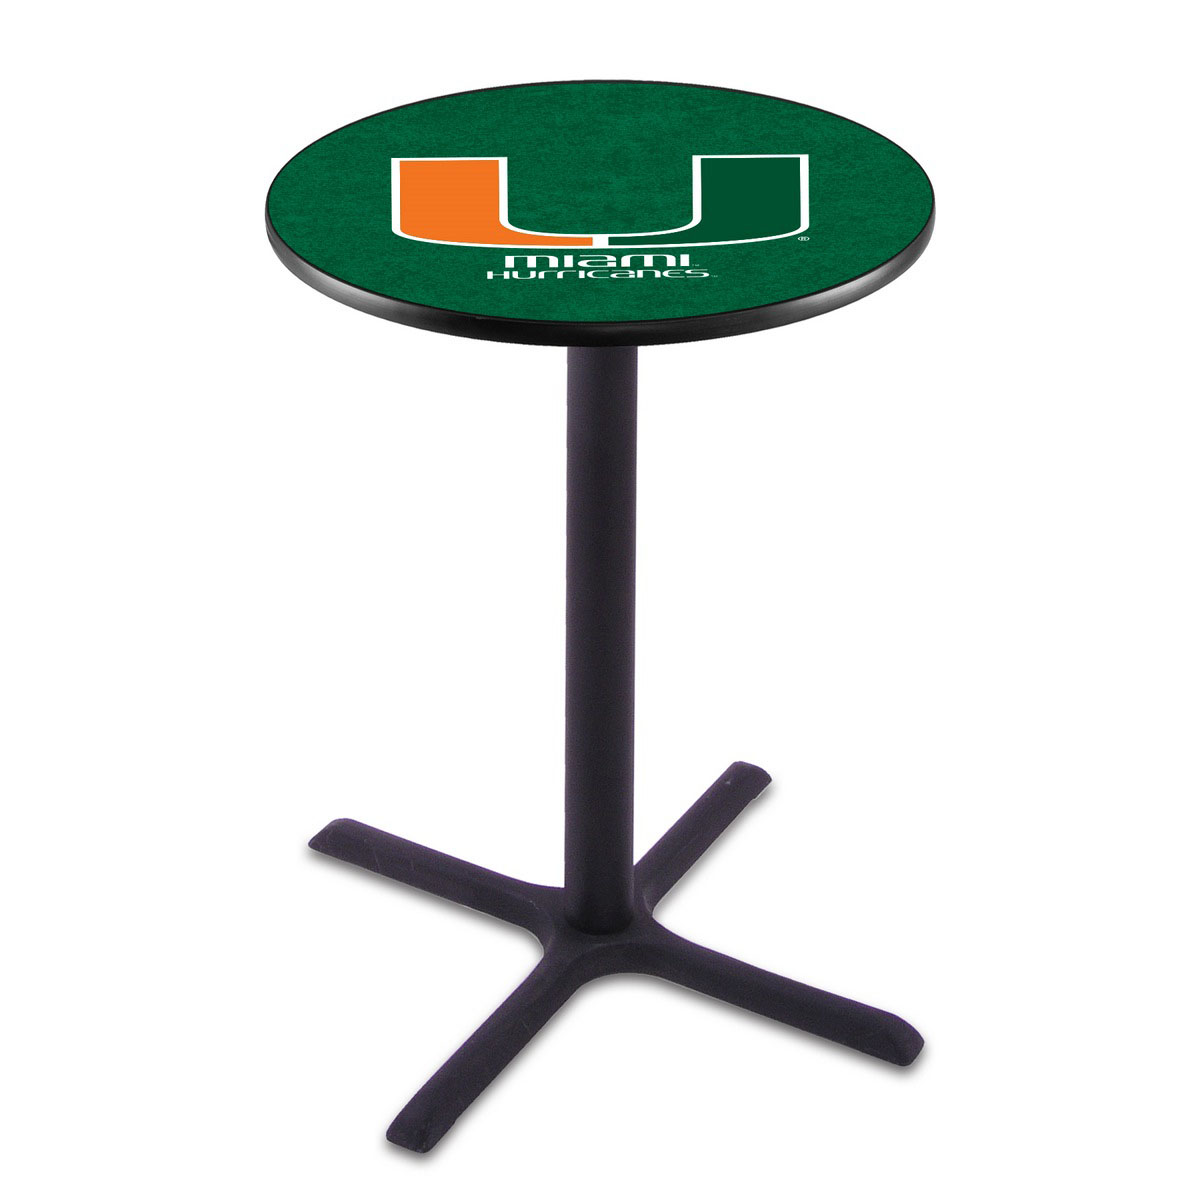 Superb-quality Miami Wrinkle Pub Table Product Photo